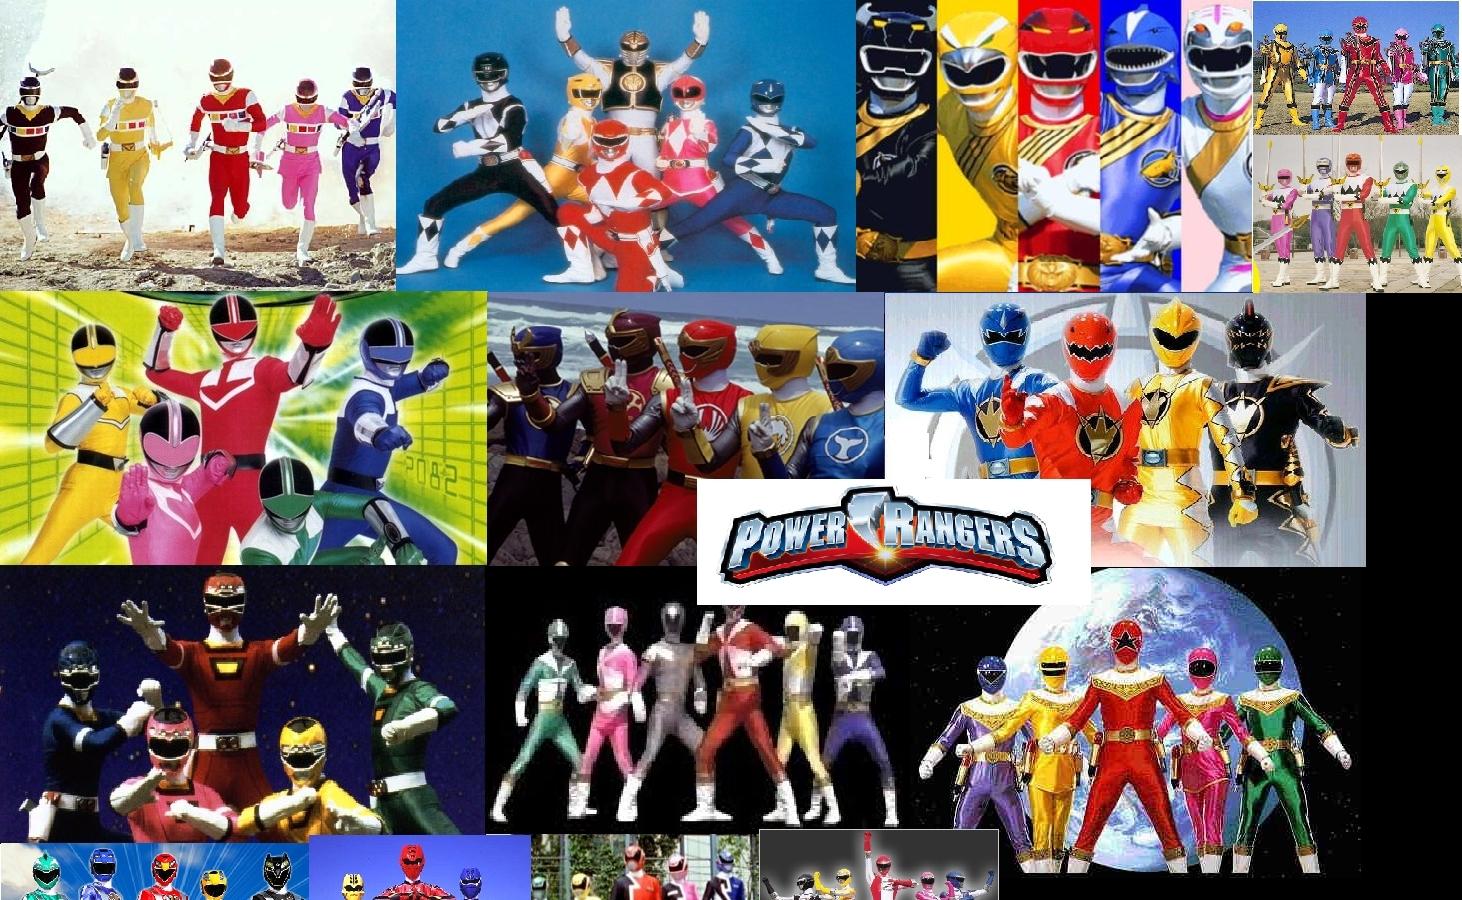 Power Rangers Wallpaper   The Power Rangers Photo 14555333 1462x900